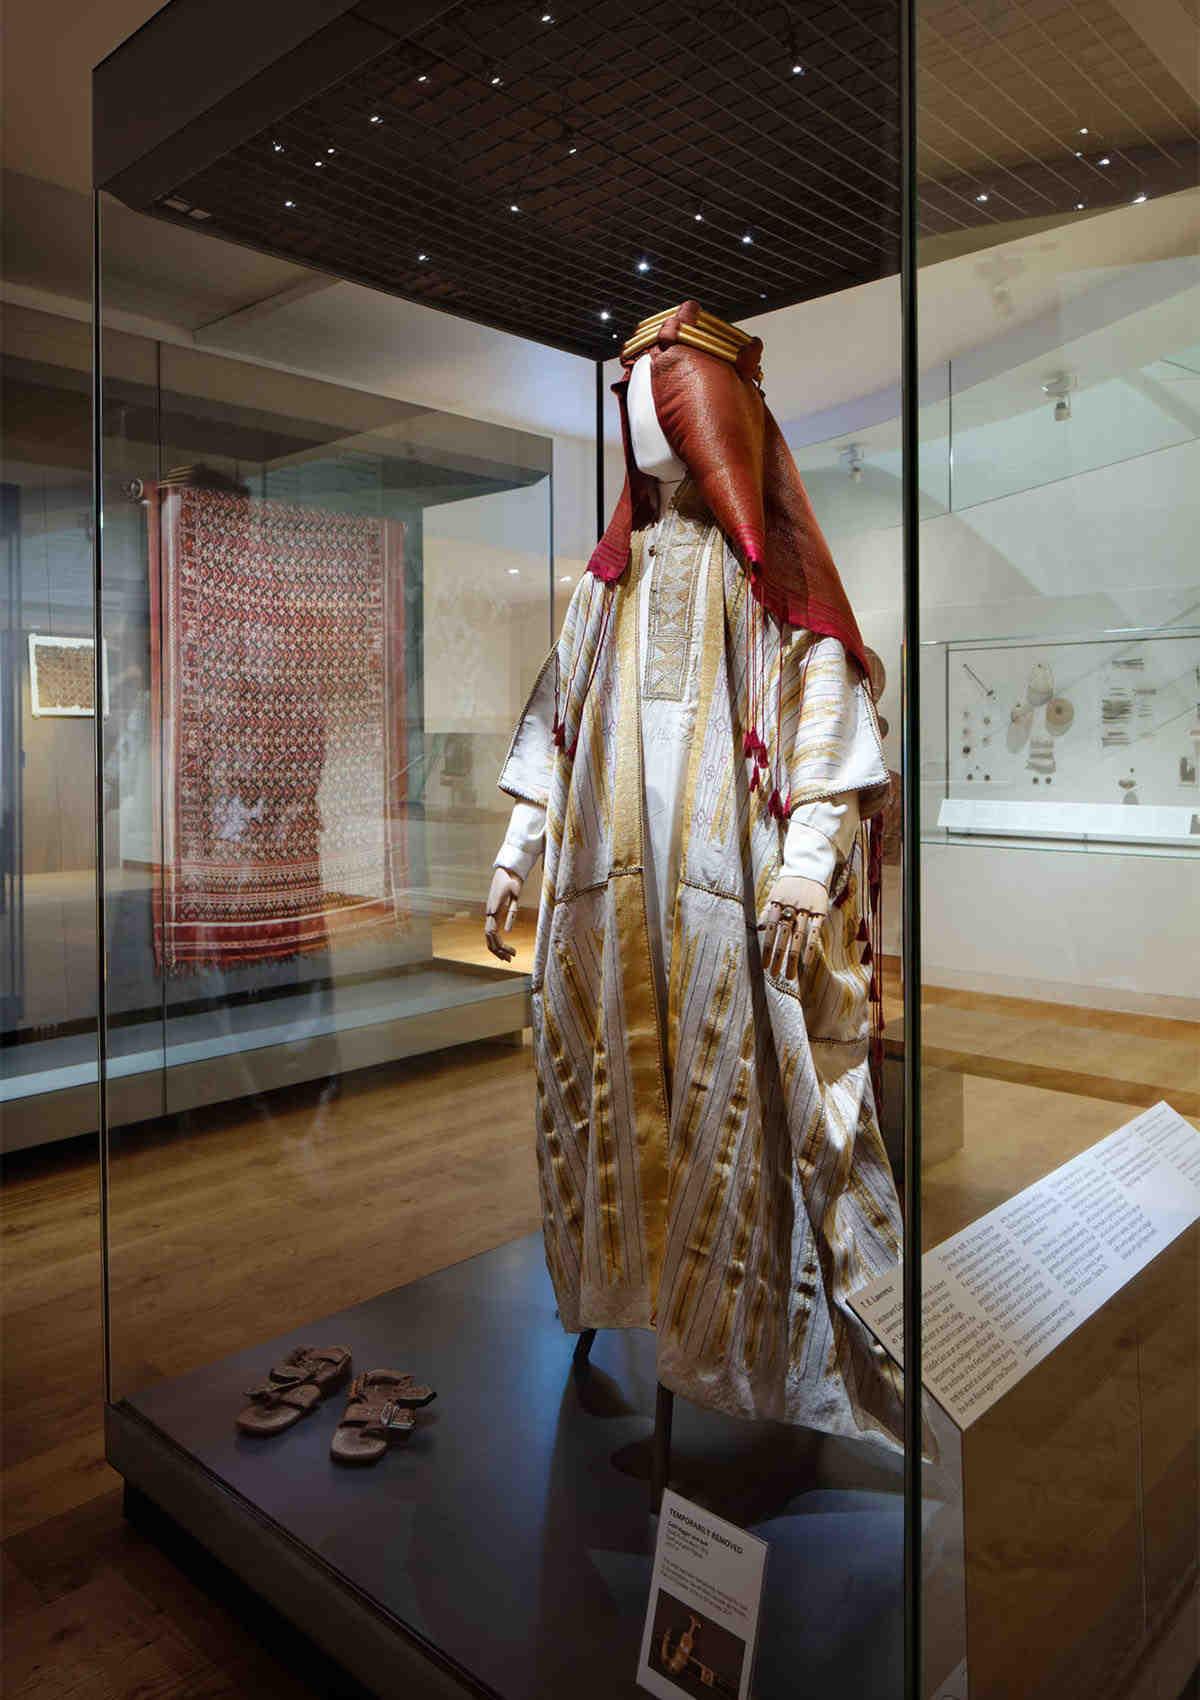 Ashmolean museum 3